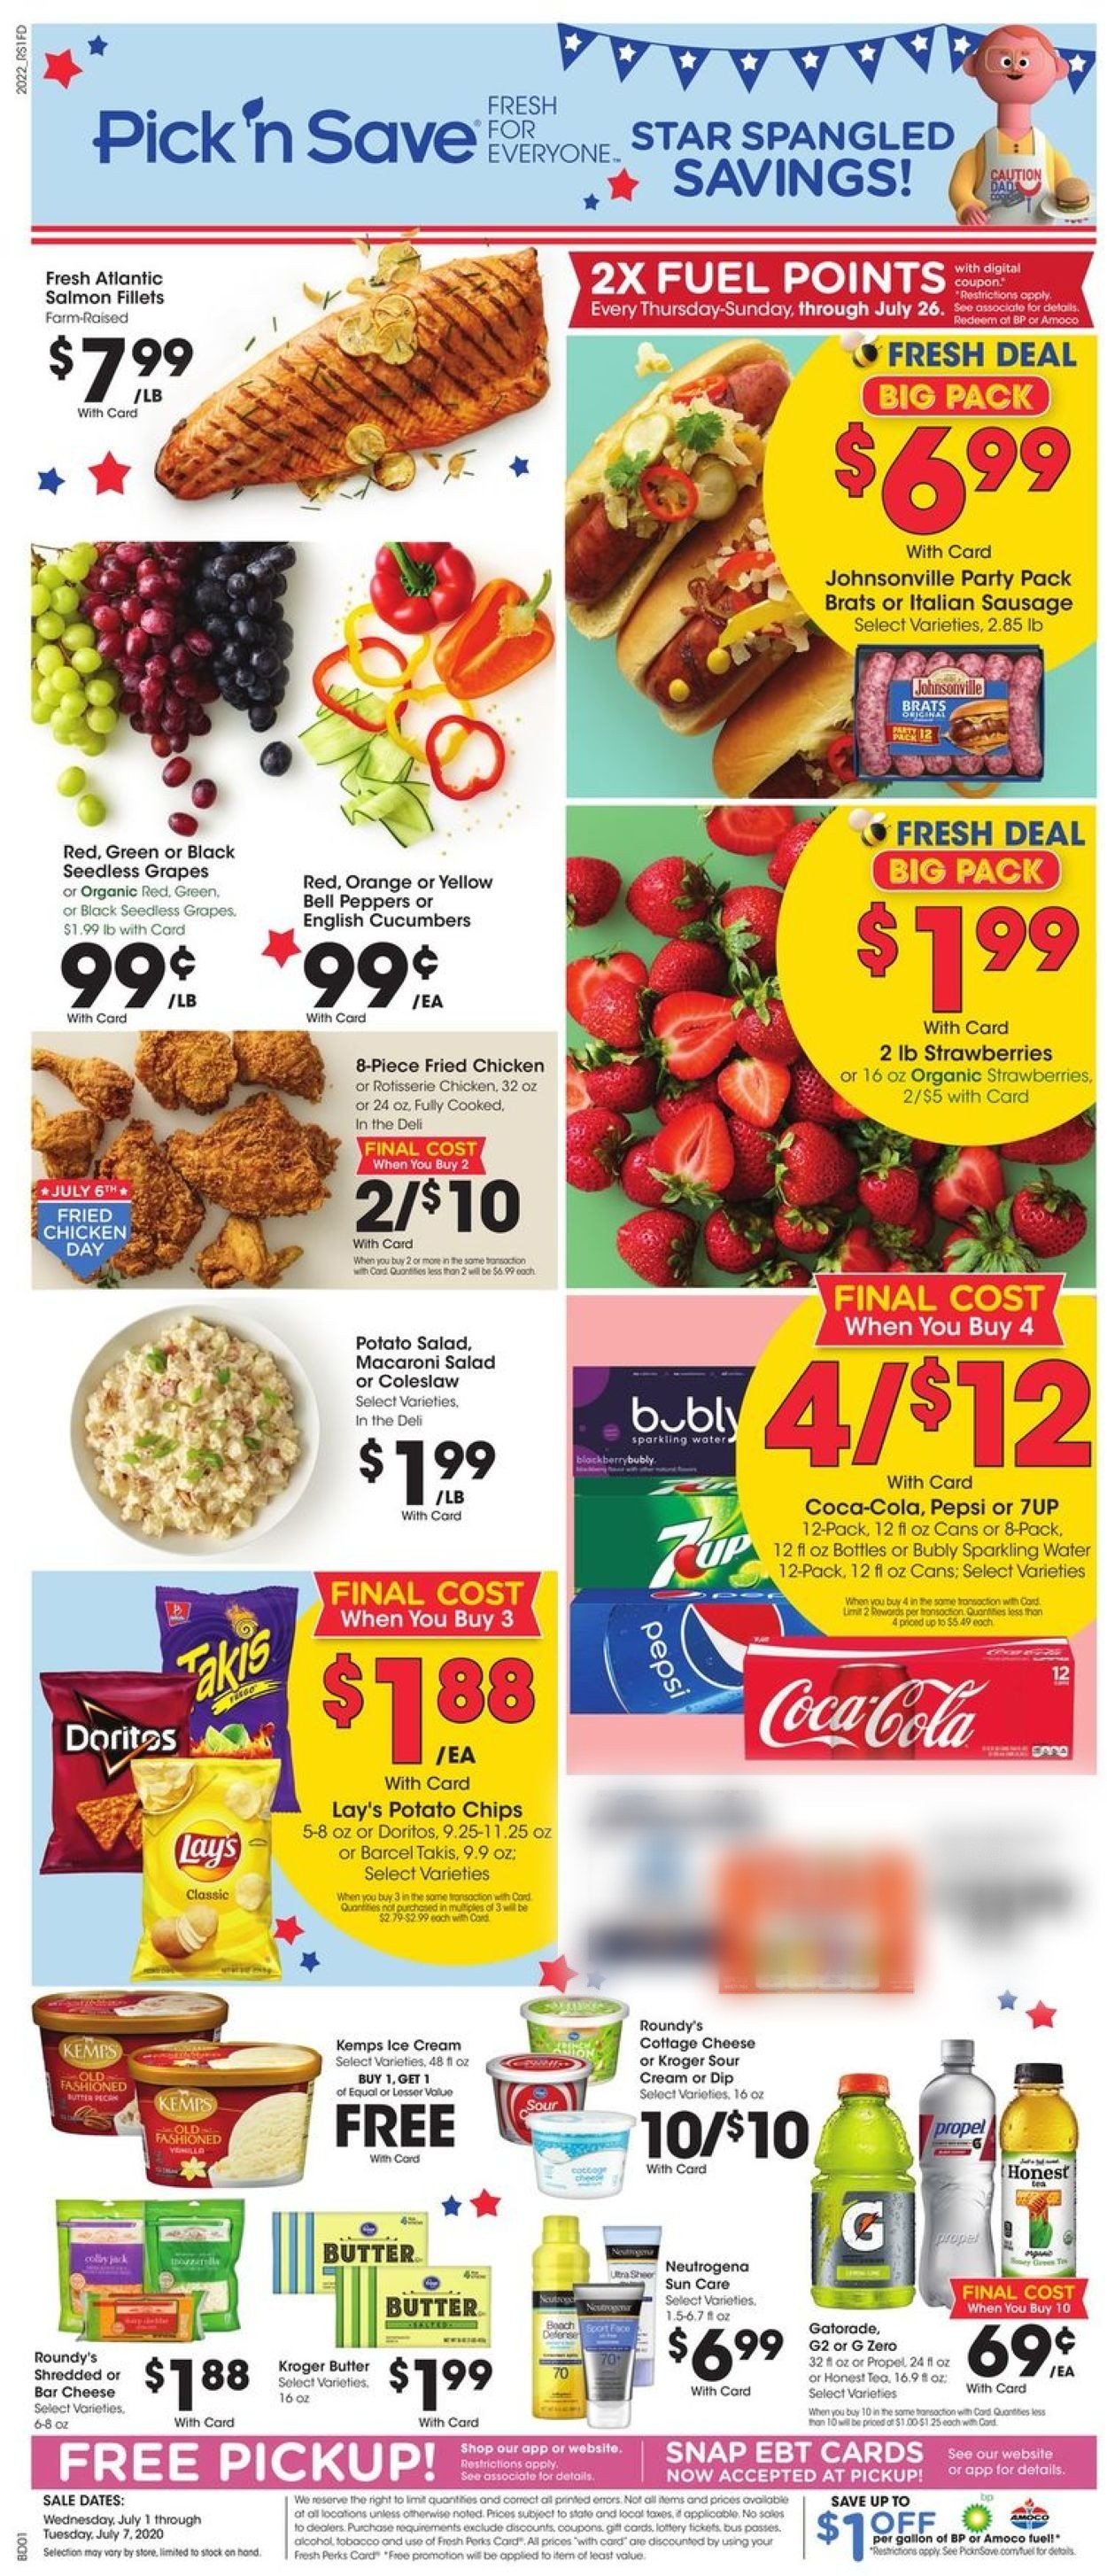 Pick 'n Save Weekly Ad Circular - valid 07/01-07/07/2020